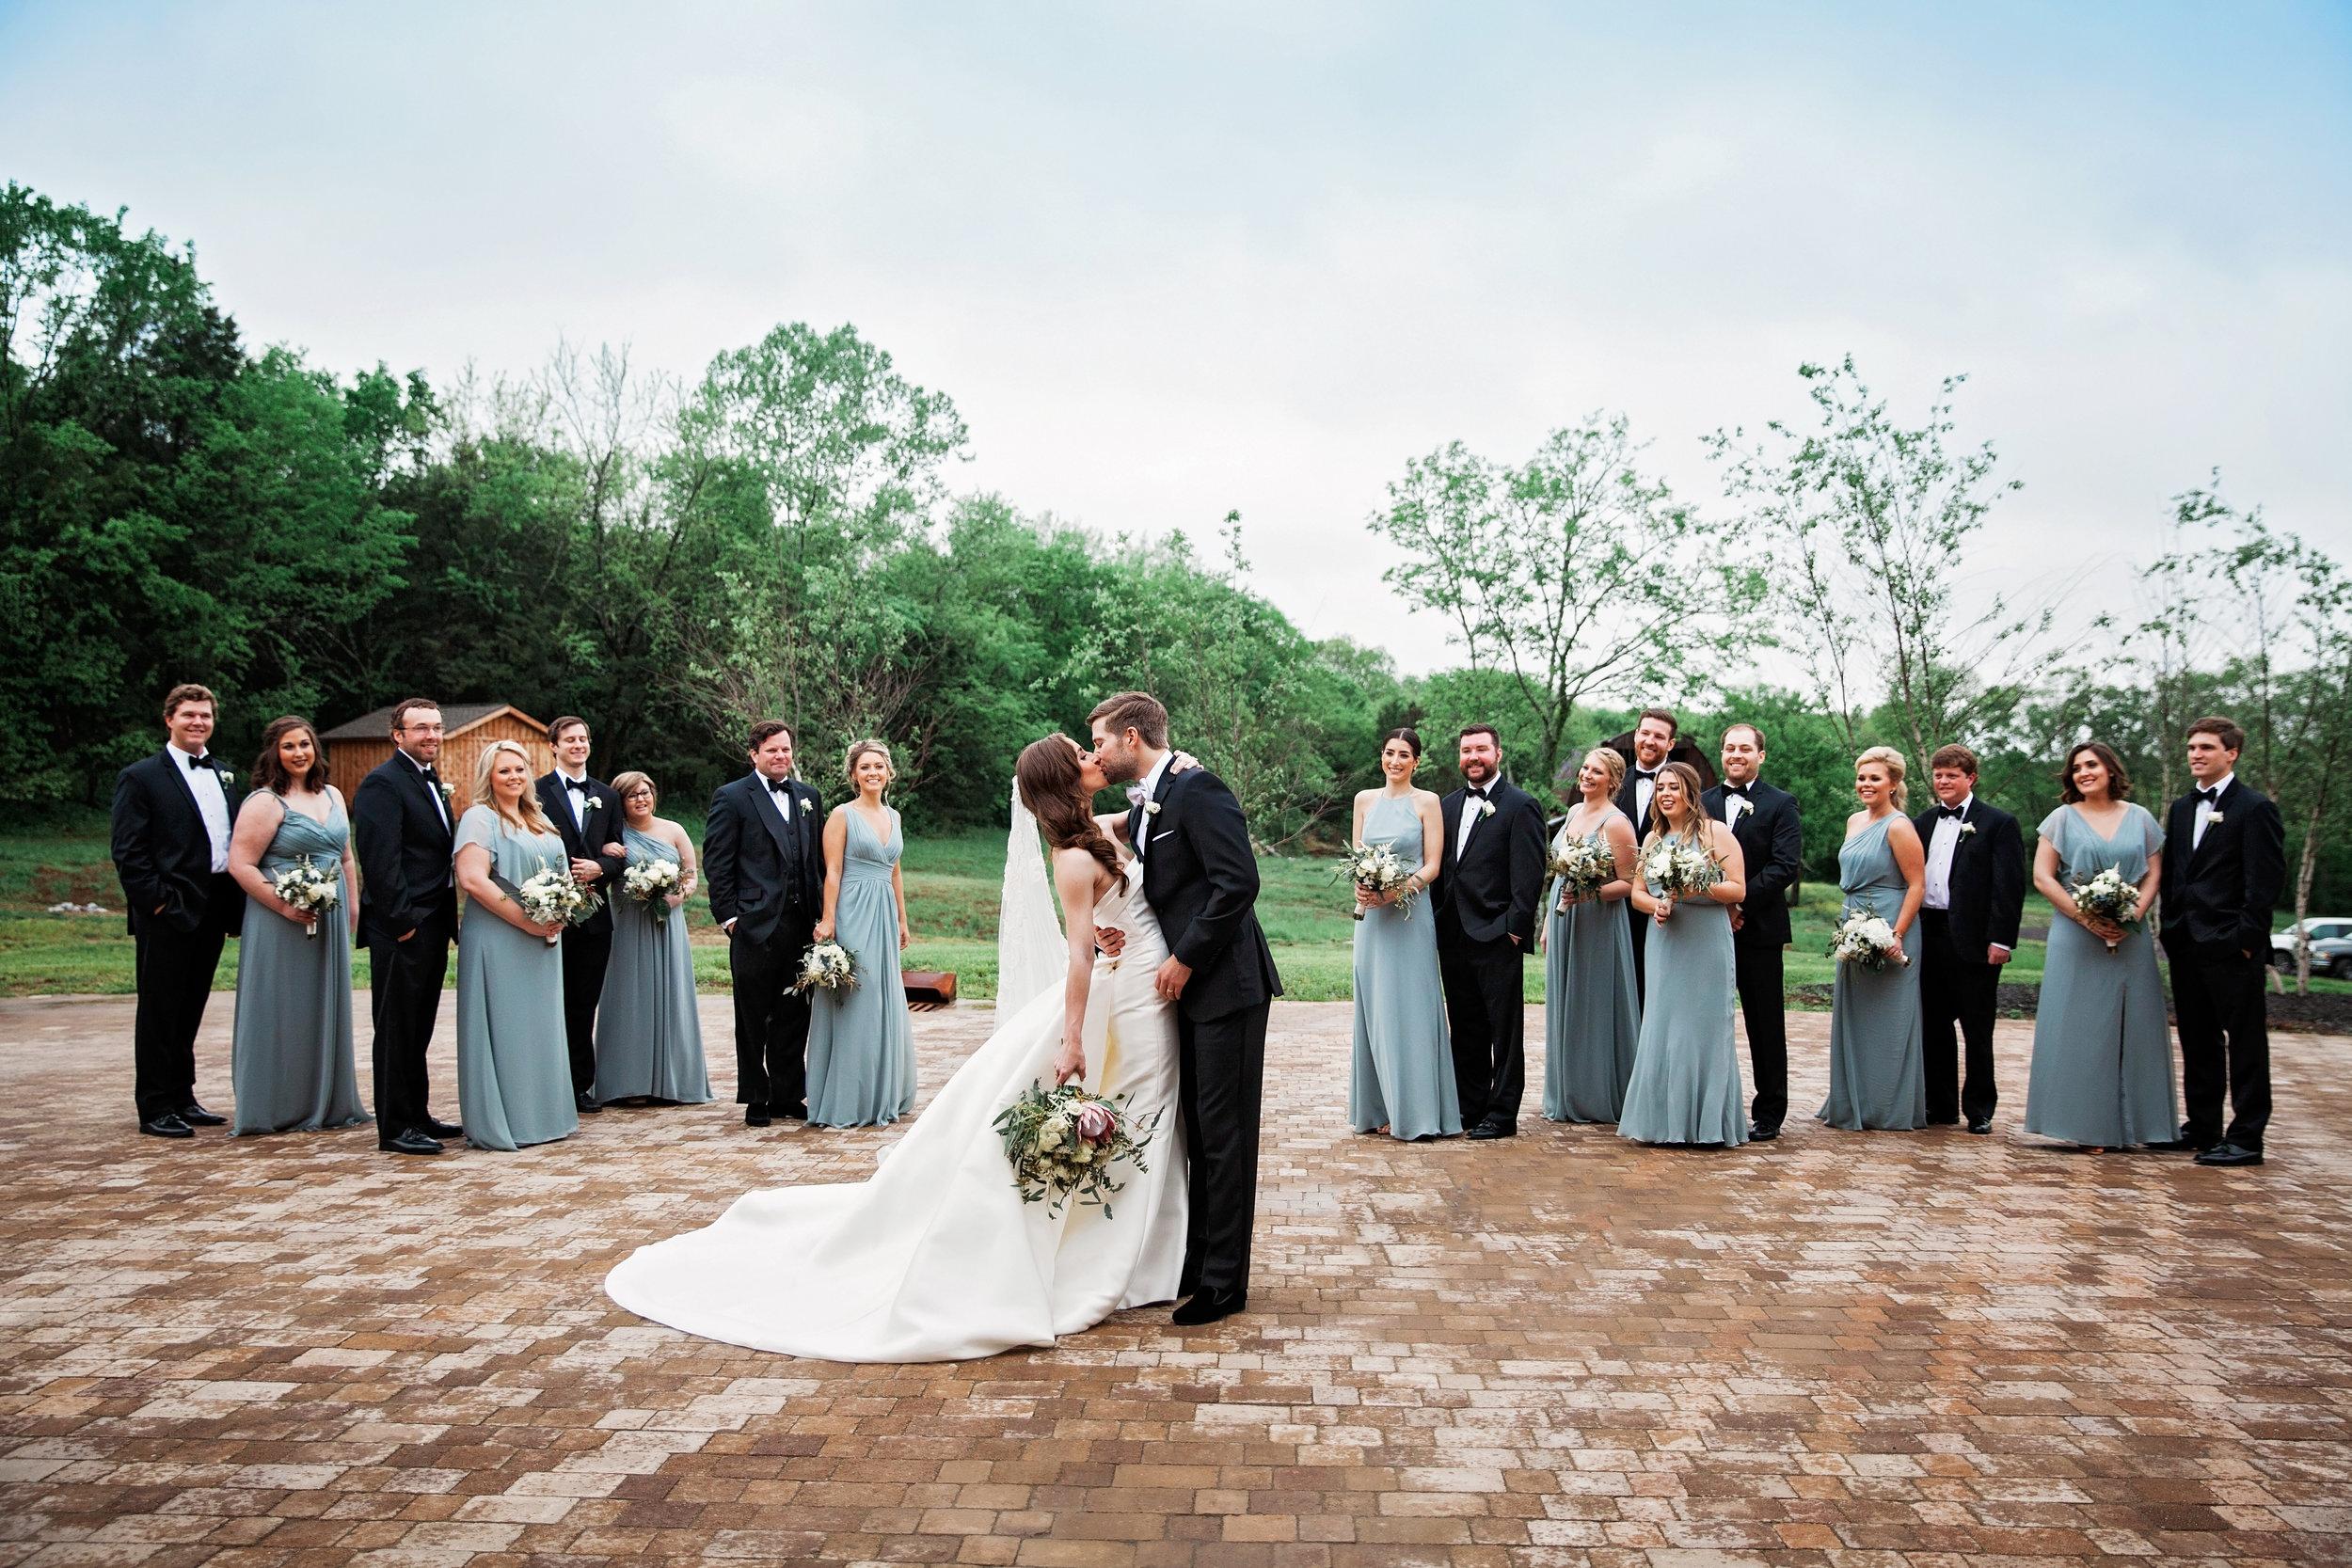 WeddingtonWedding0807.jpg